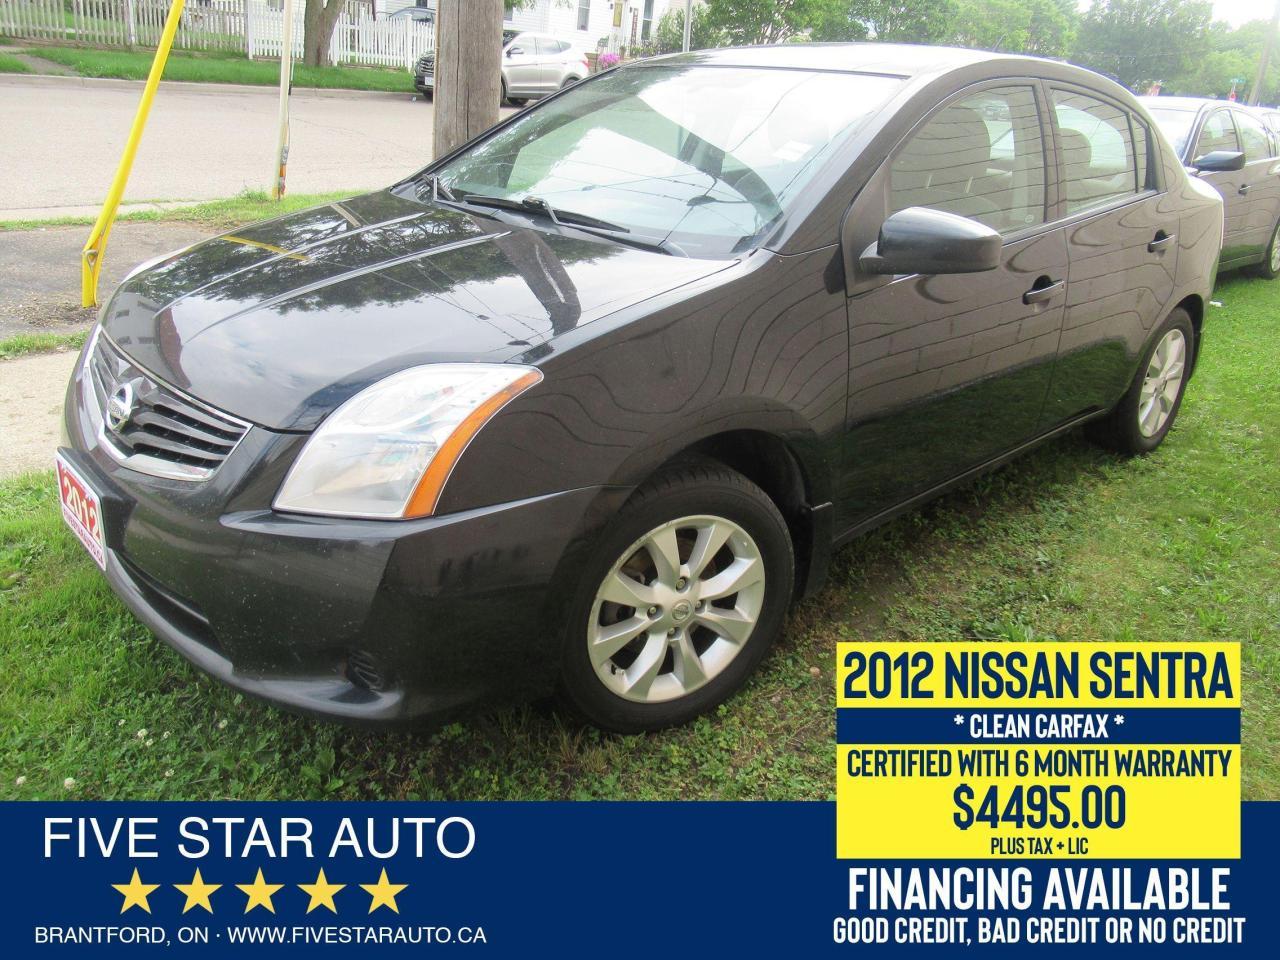 2012 Nissan Sentra 2.0 *Clean Carfax* Certified w/ 6 Month Warranty